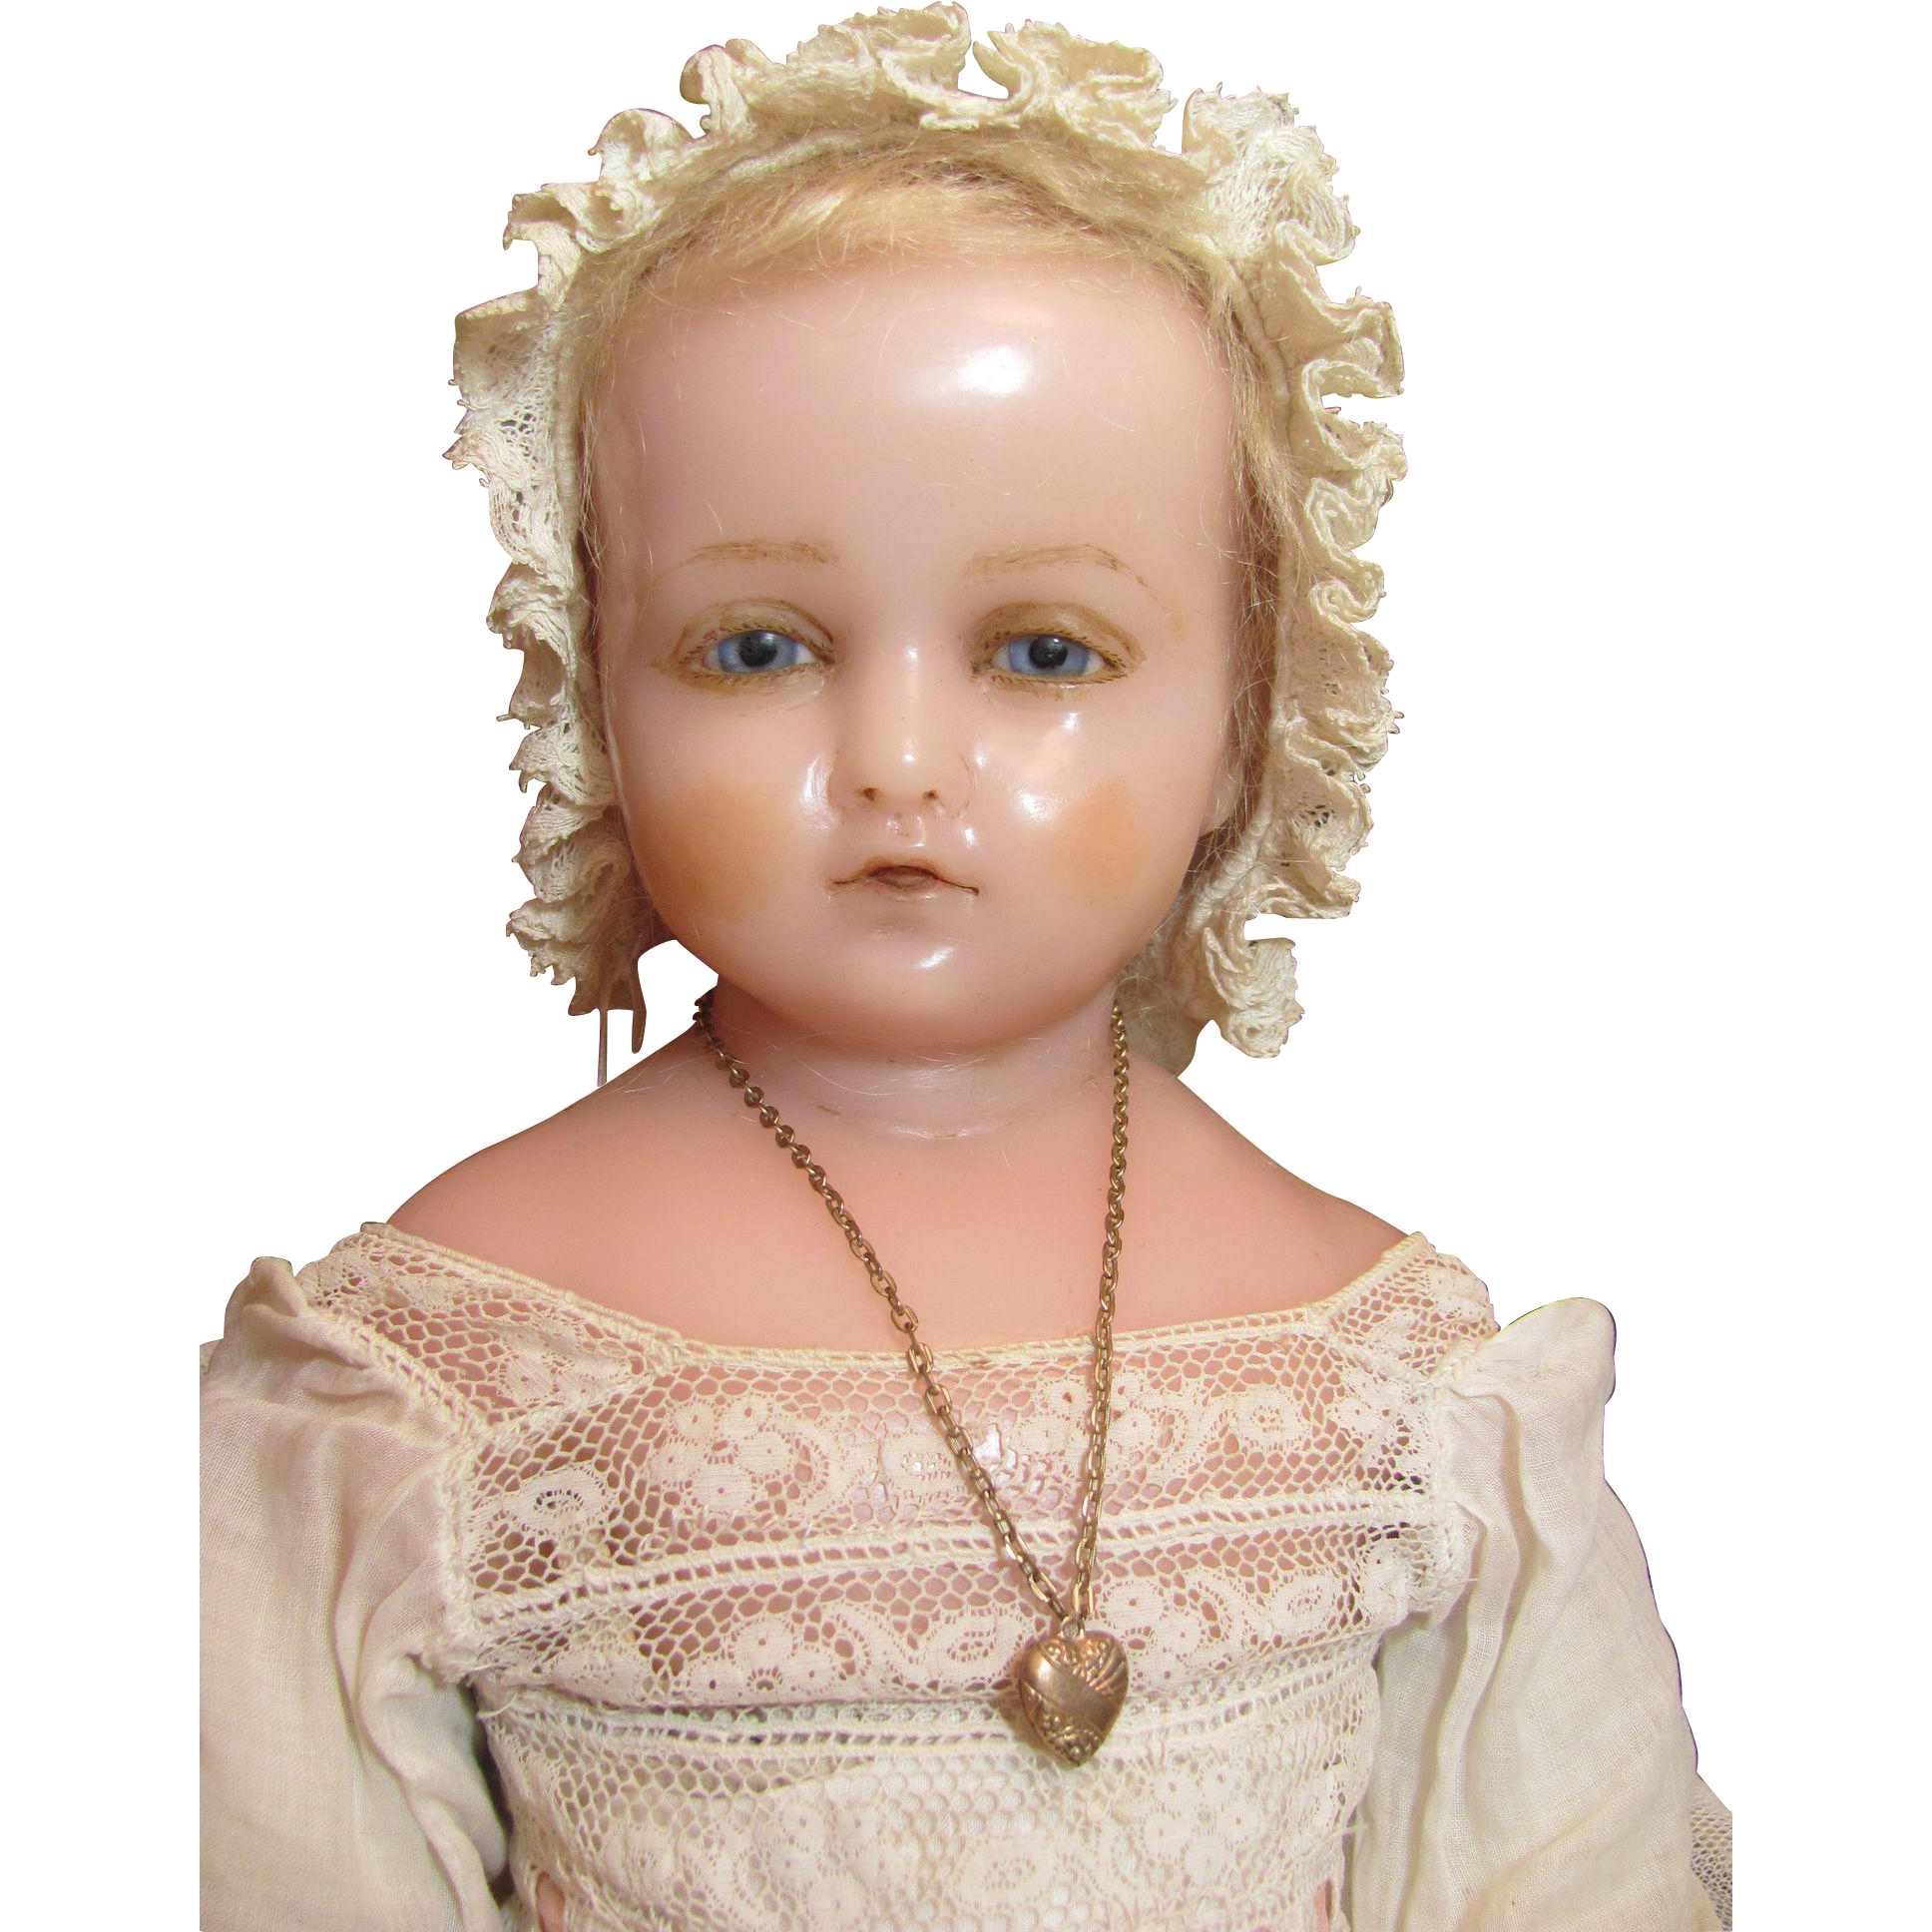 Pierrotti Baby Face English Poured Wax Doll Circa1871